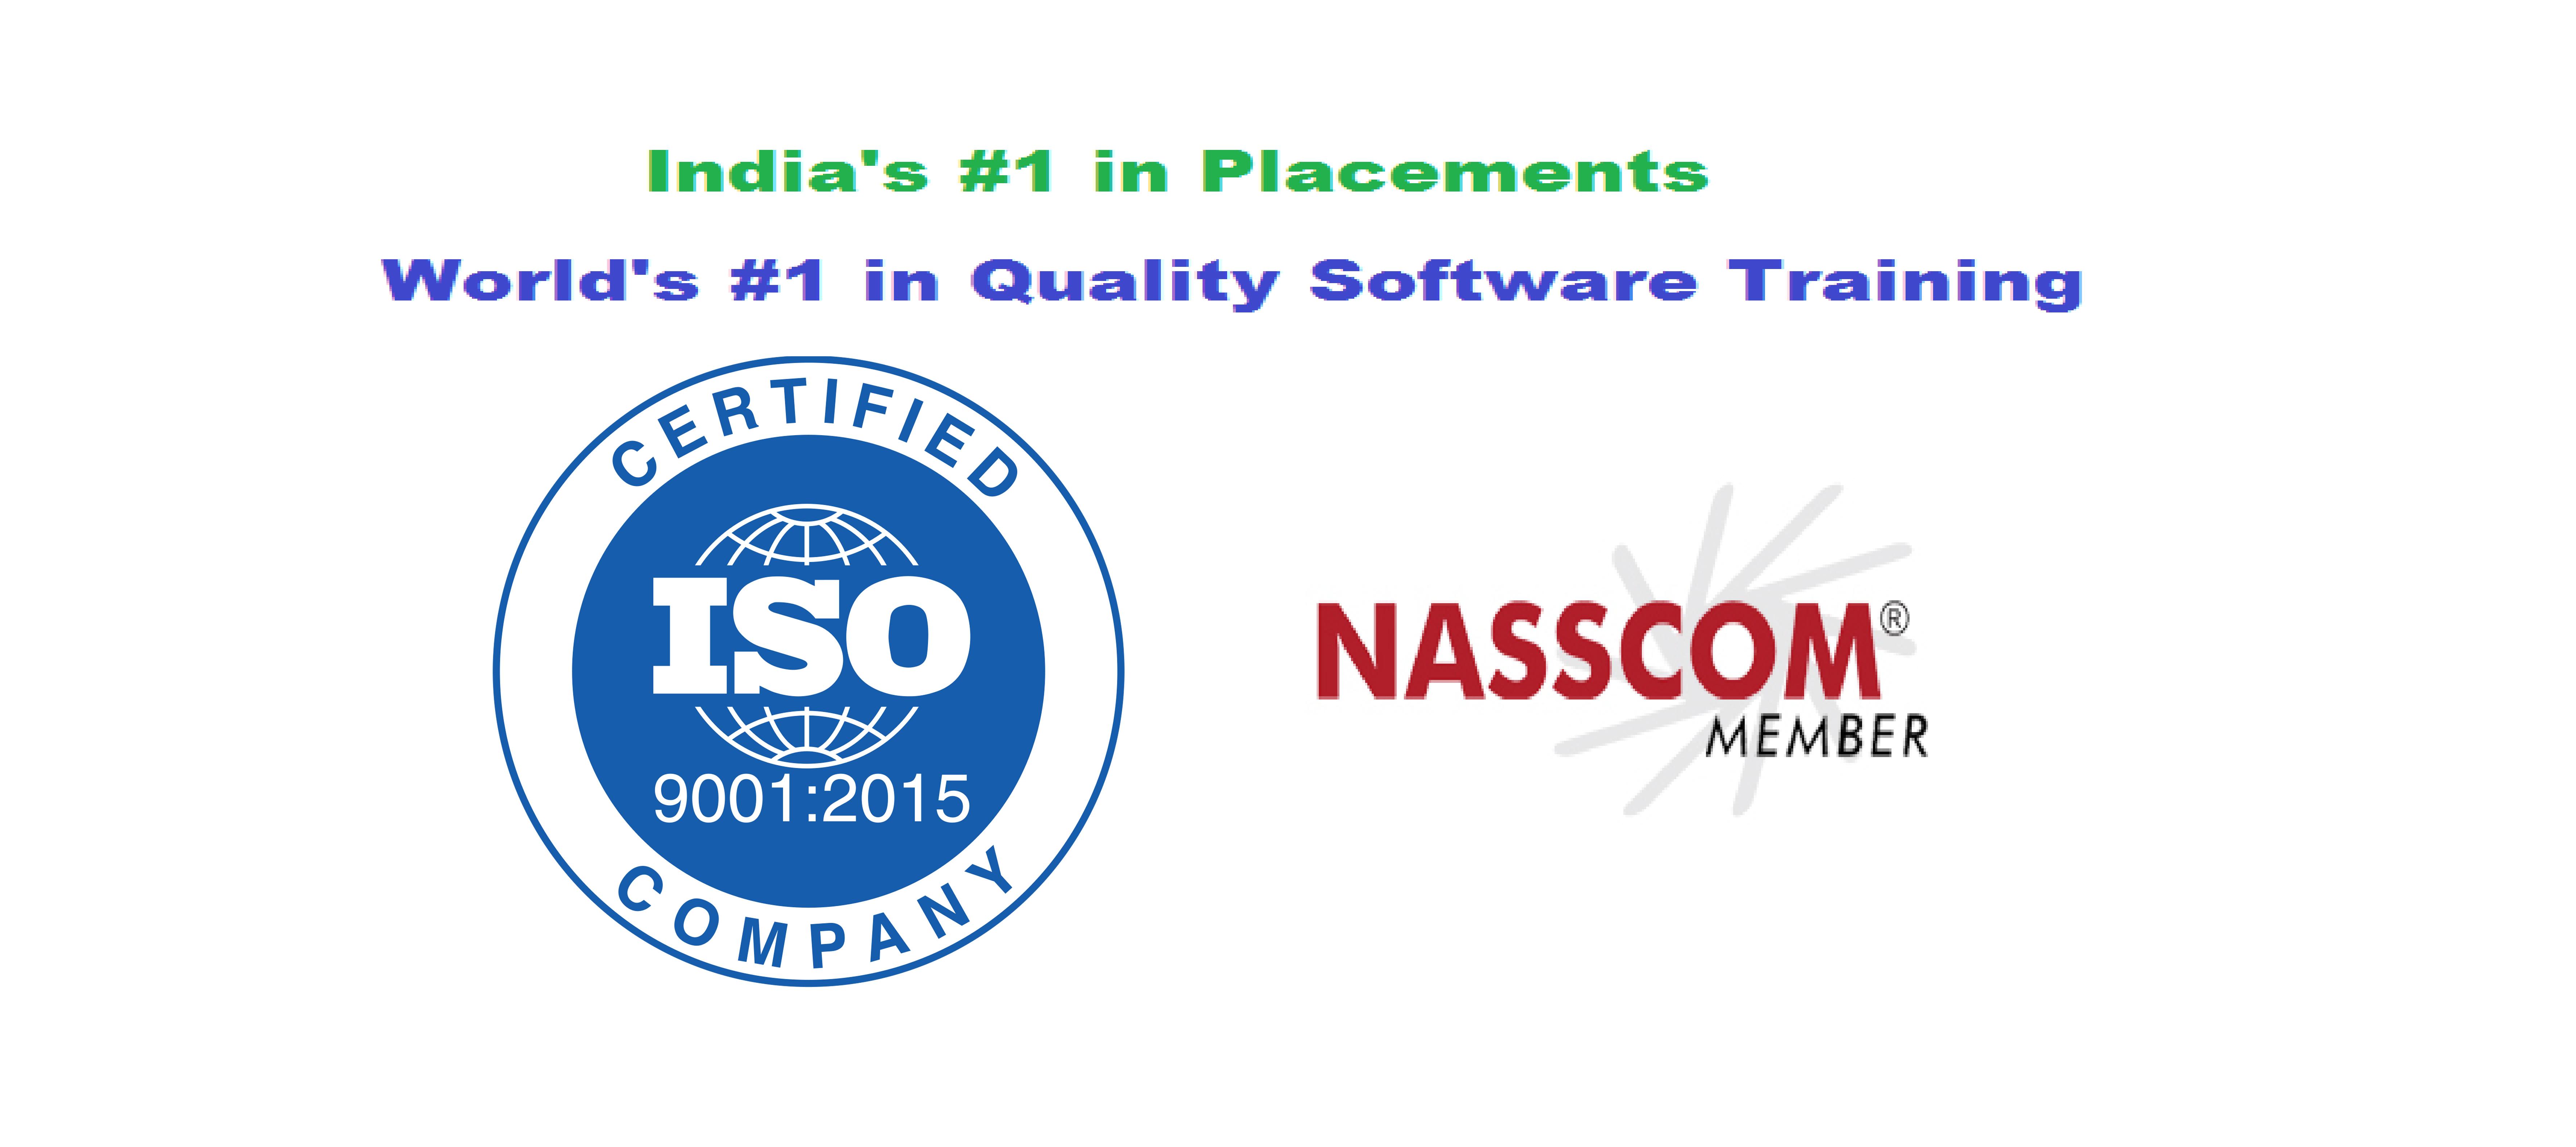 palle_technologies_iso_certified_nasscom_member